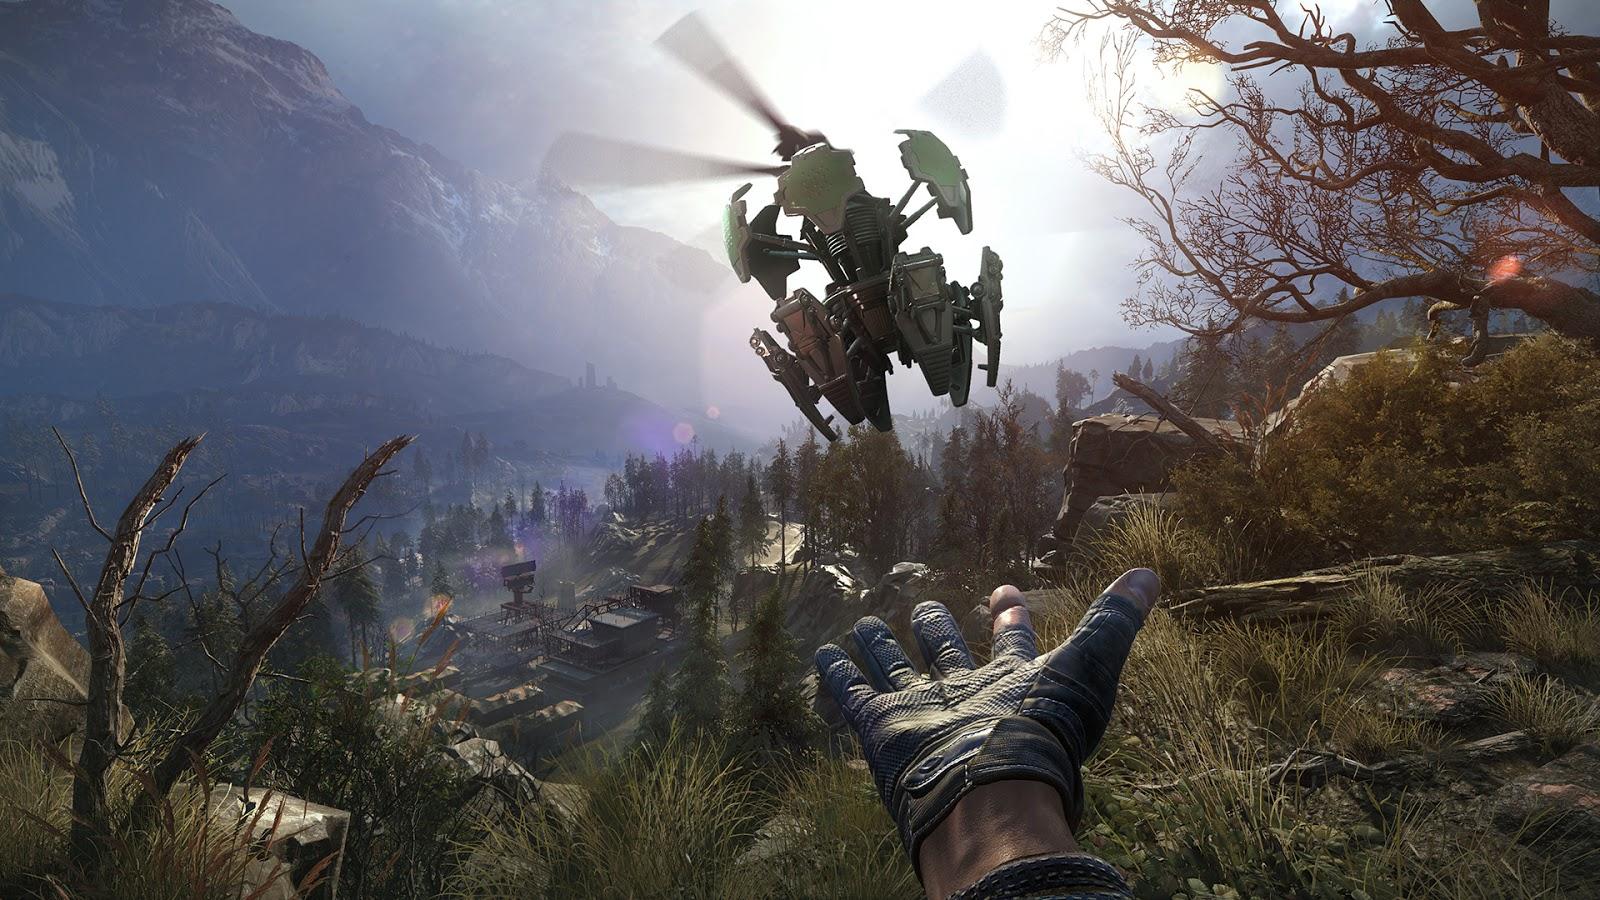 Sniper Ghost Warrior 3 ESPAÑOL PC (CPY) + Update v1.08 (PLAZA) + REPACK 10 DVD5 (JPW) 4